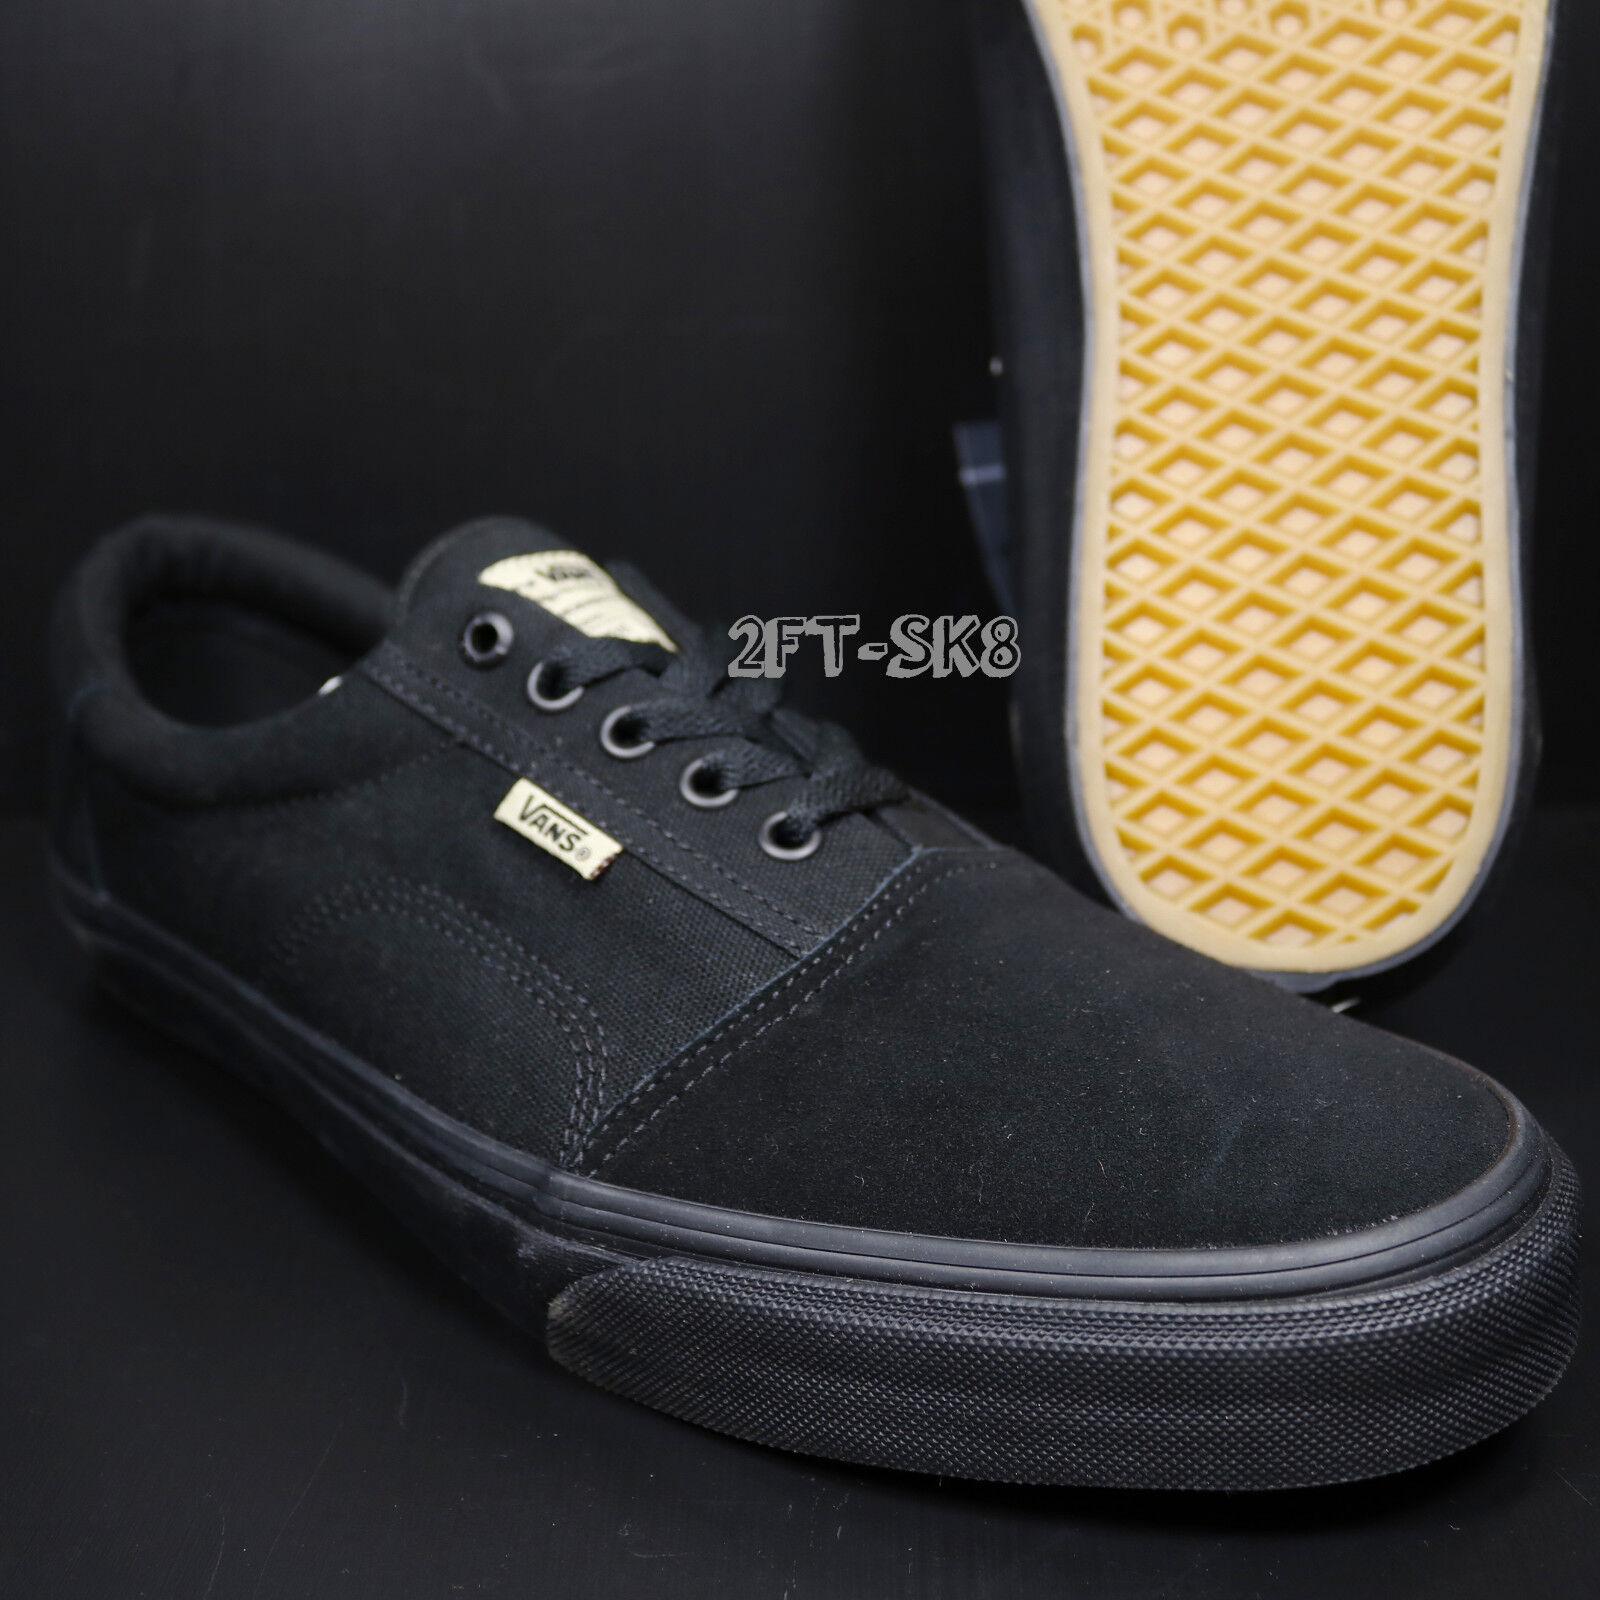 VANS ROWLEY SOLOS schwarz schwarz SOLE herren SKATE schuhe    S89142.234